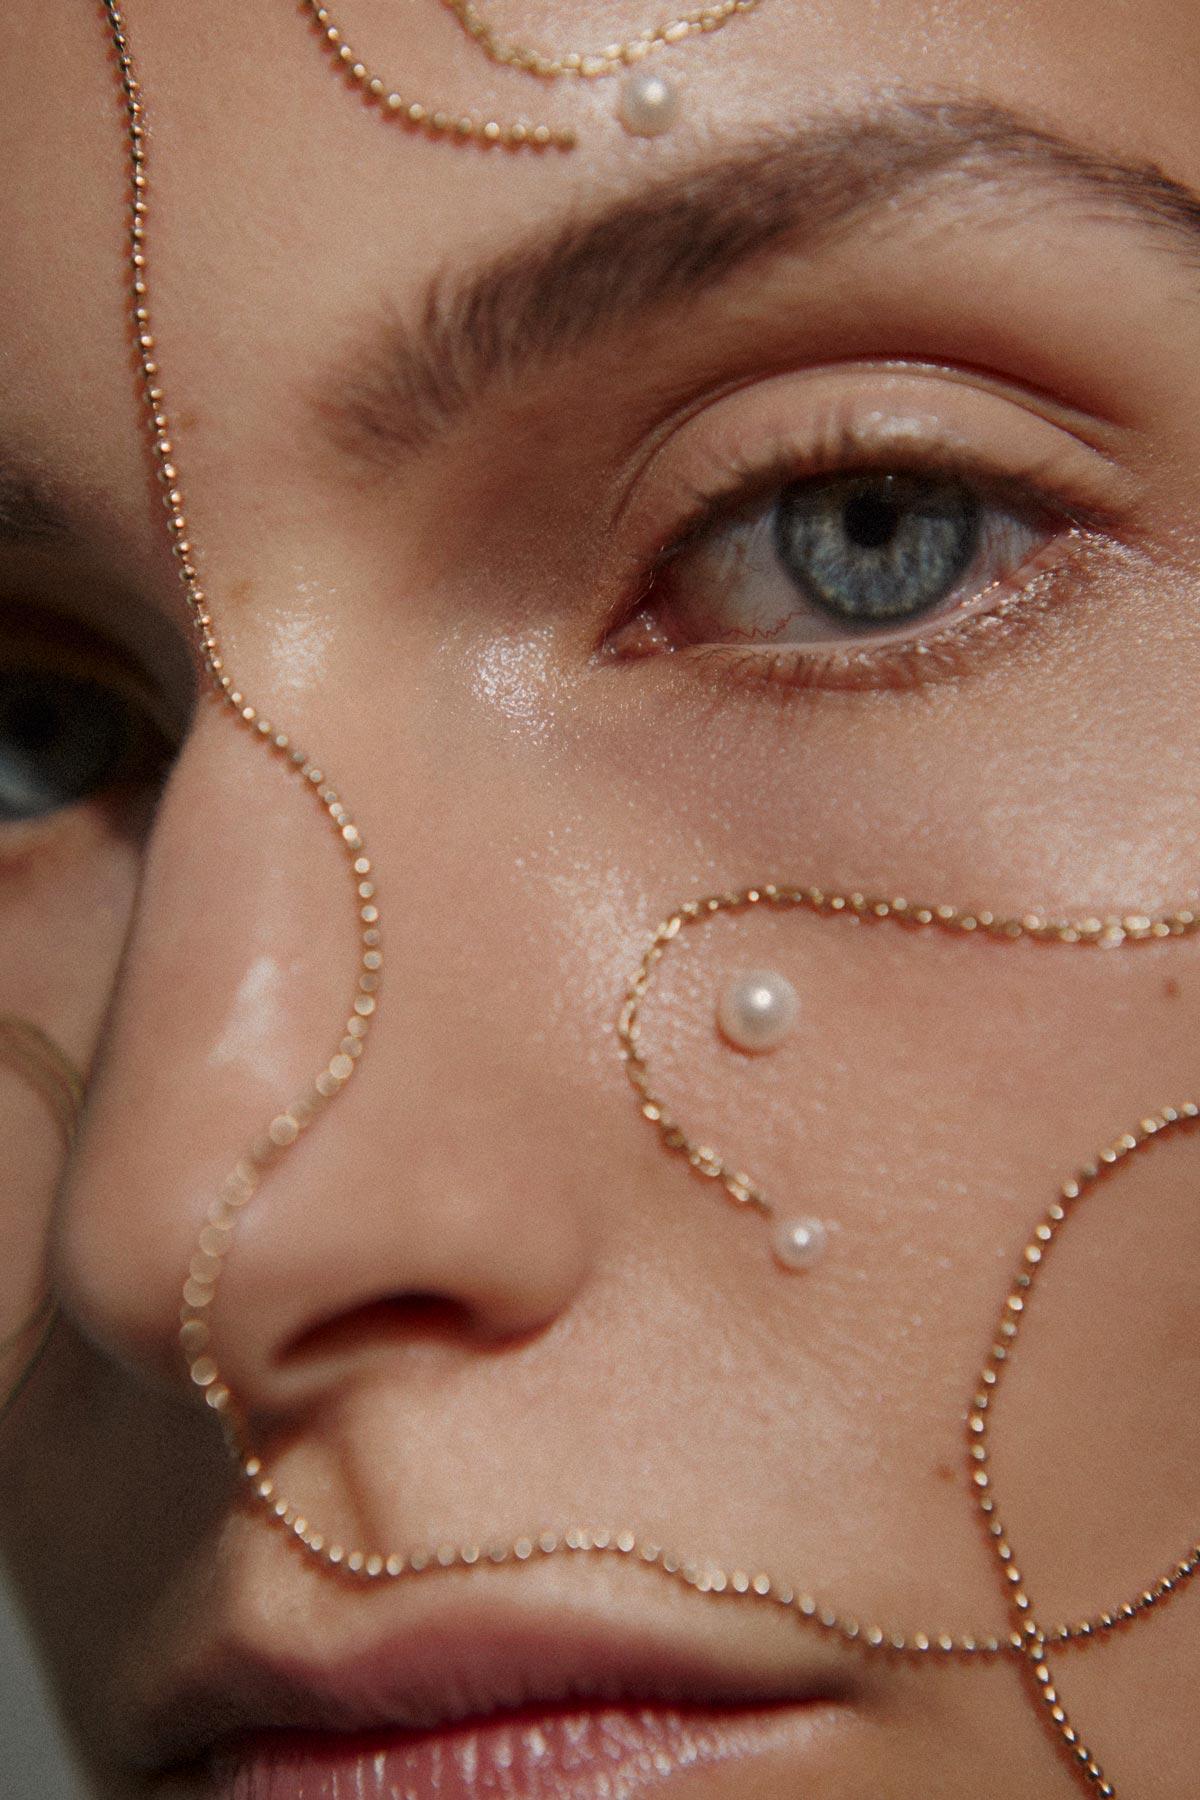 CloseupMetal.jpg